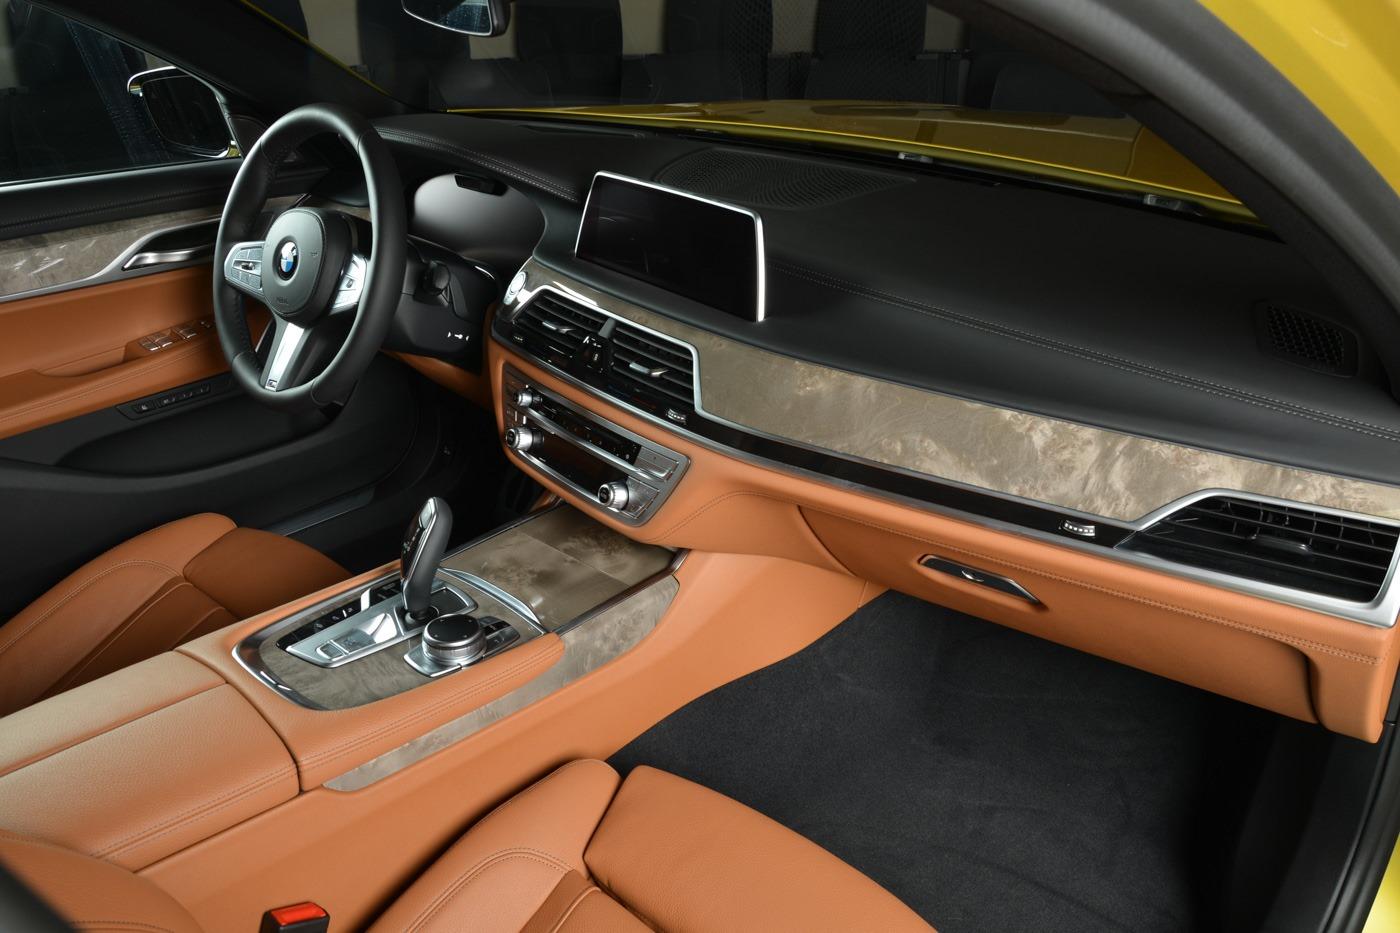 BMW-7-Series-730Li-M-Sport-Package-in-Austin-Yellow-9